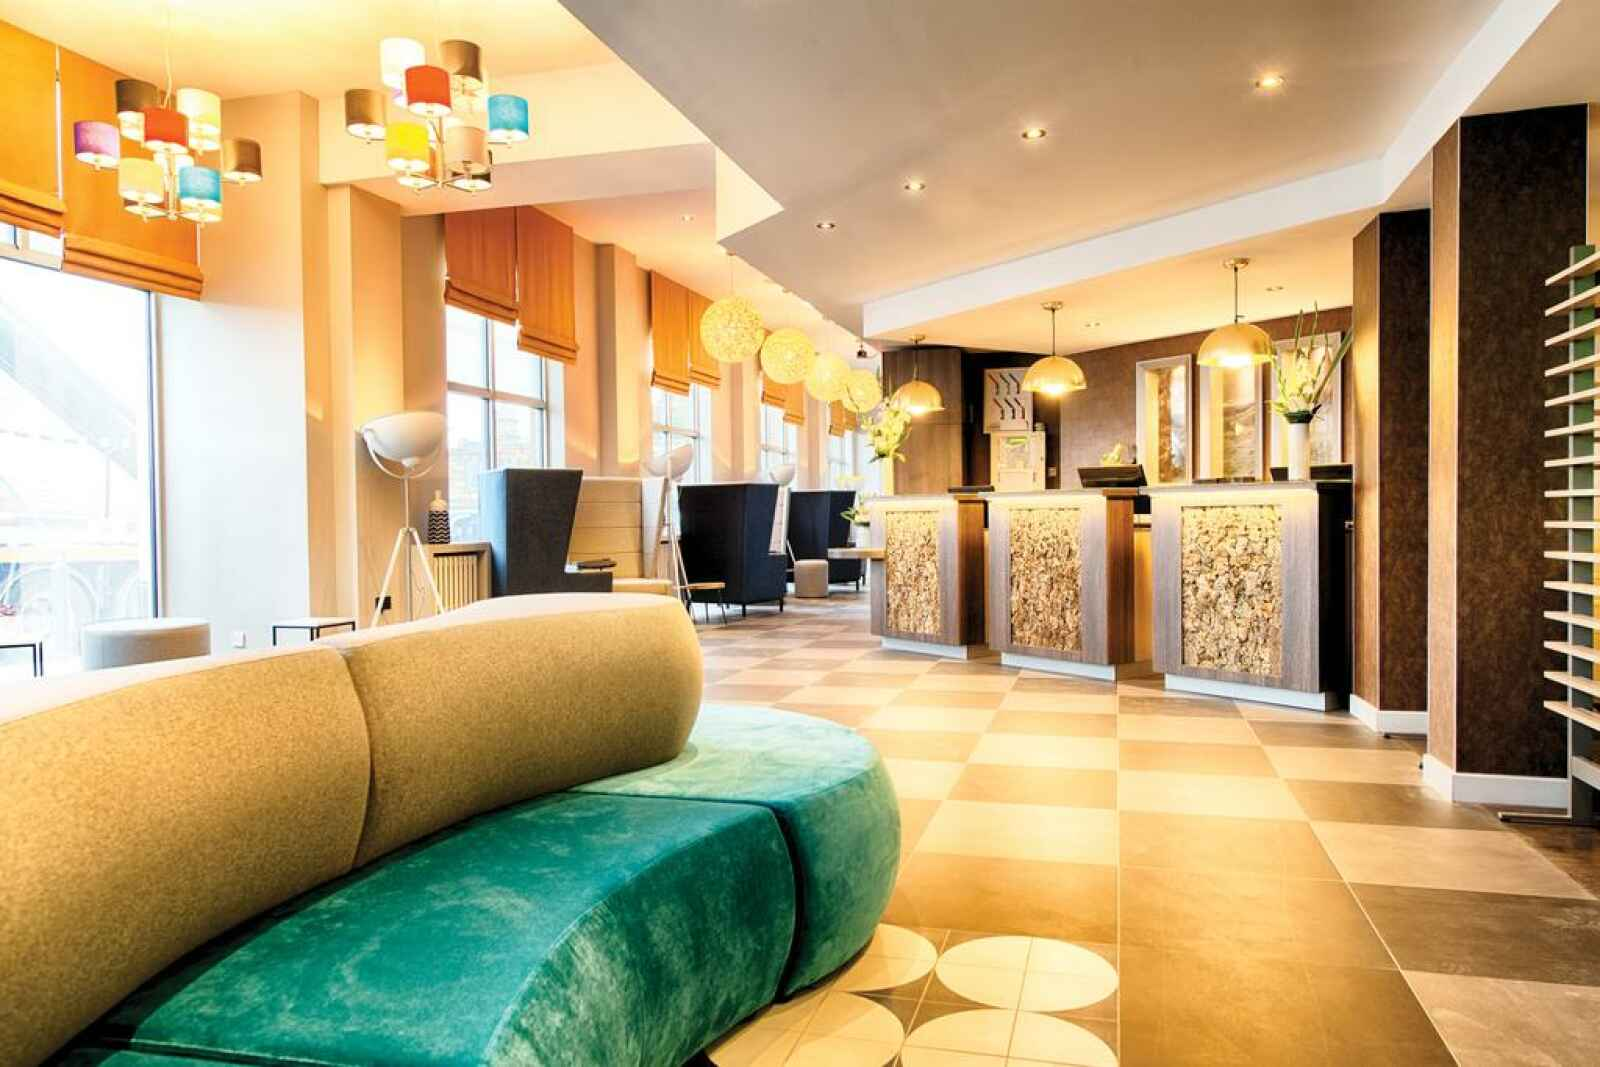 Ecosse - Grande-Bretagne - Edimbourg - Royaume Uni - Hôtel Leonardo Royal